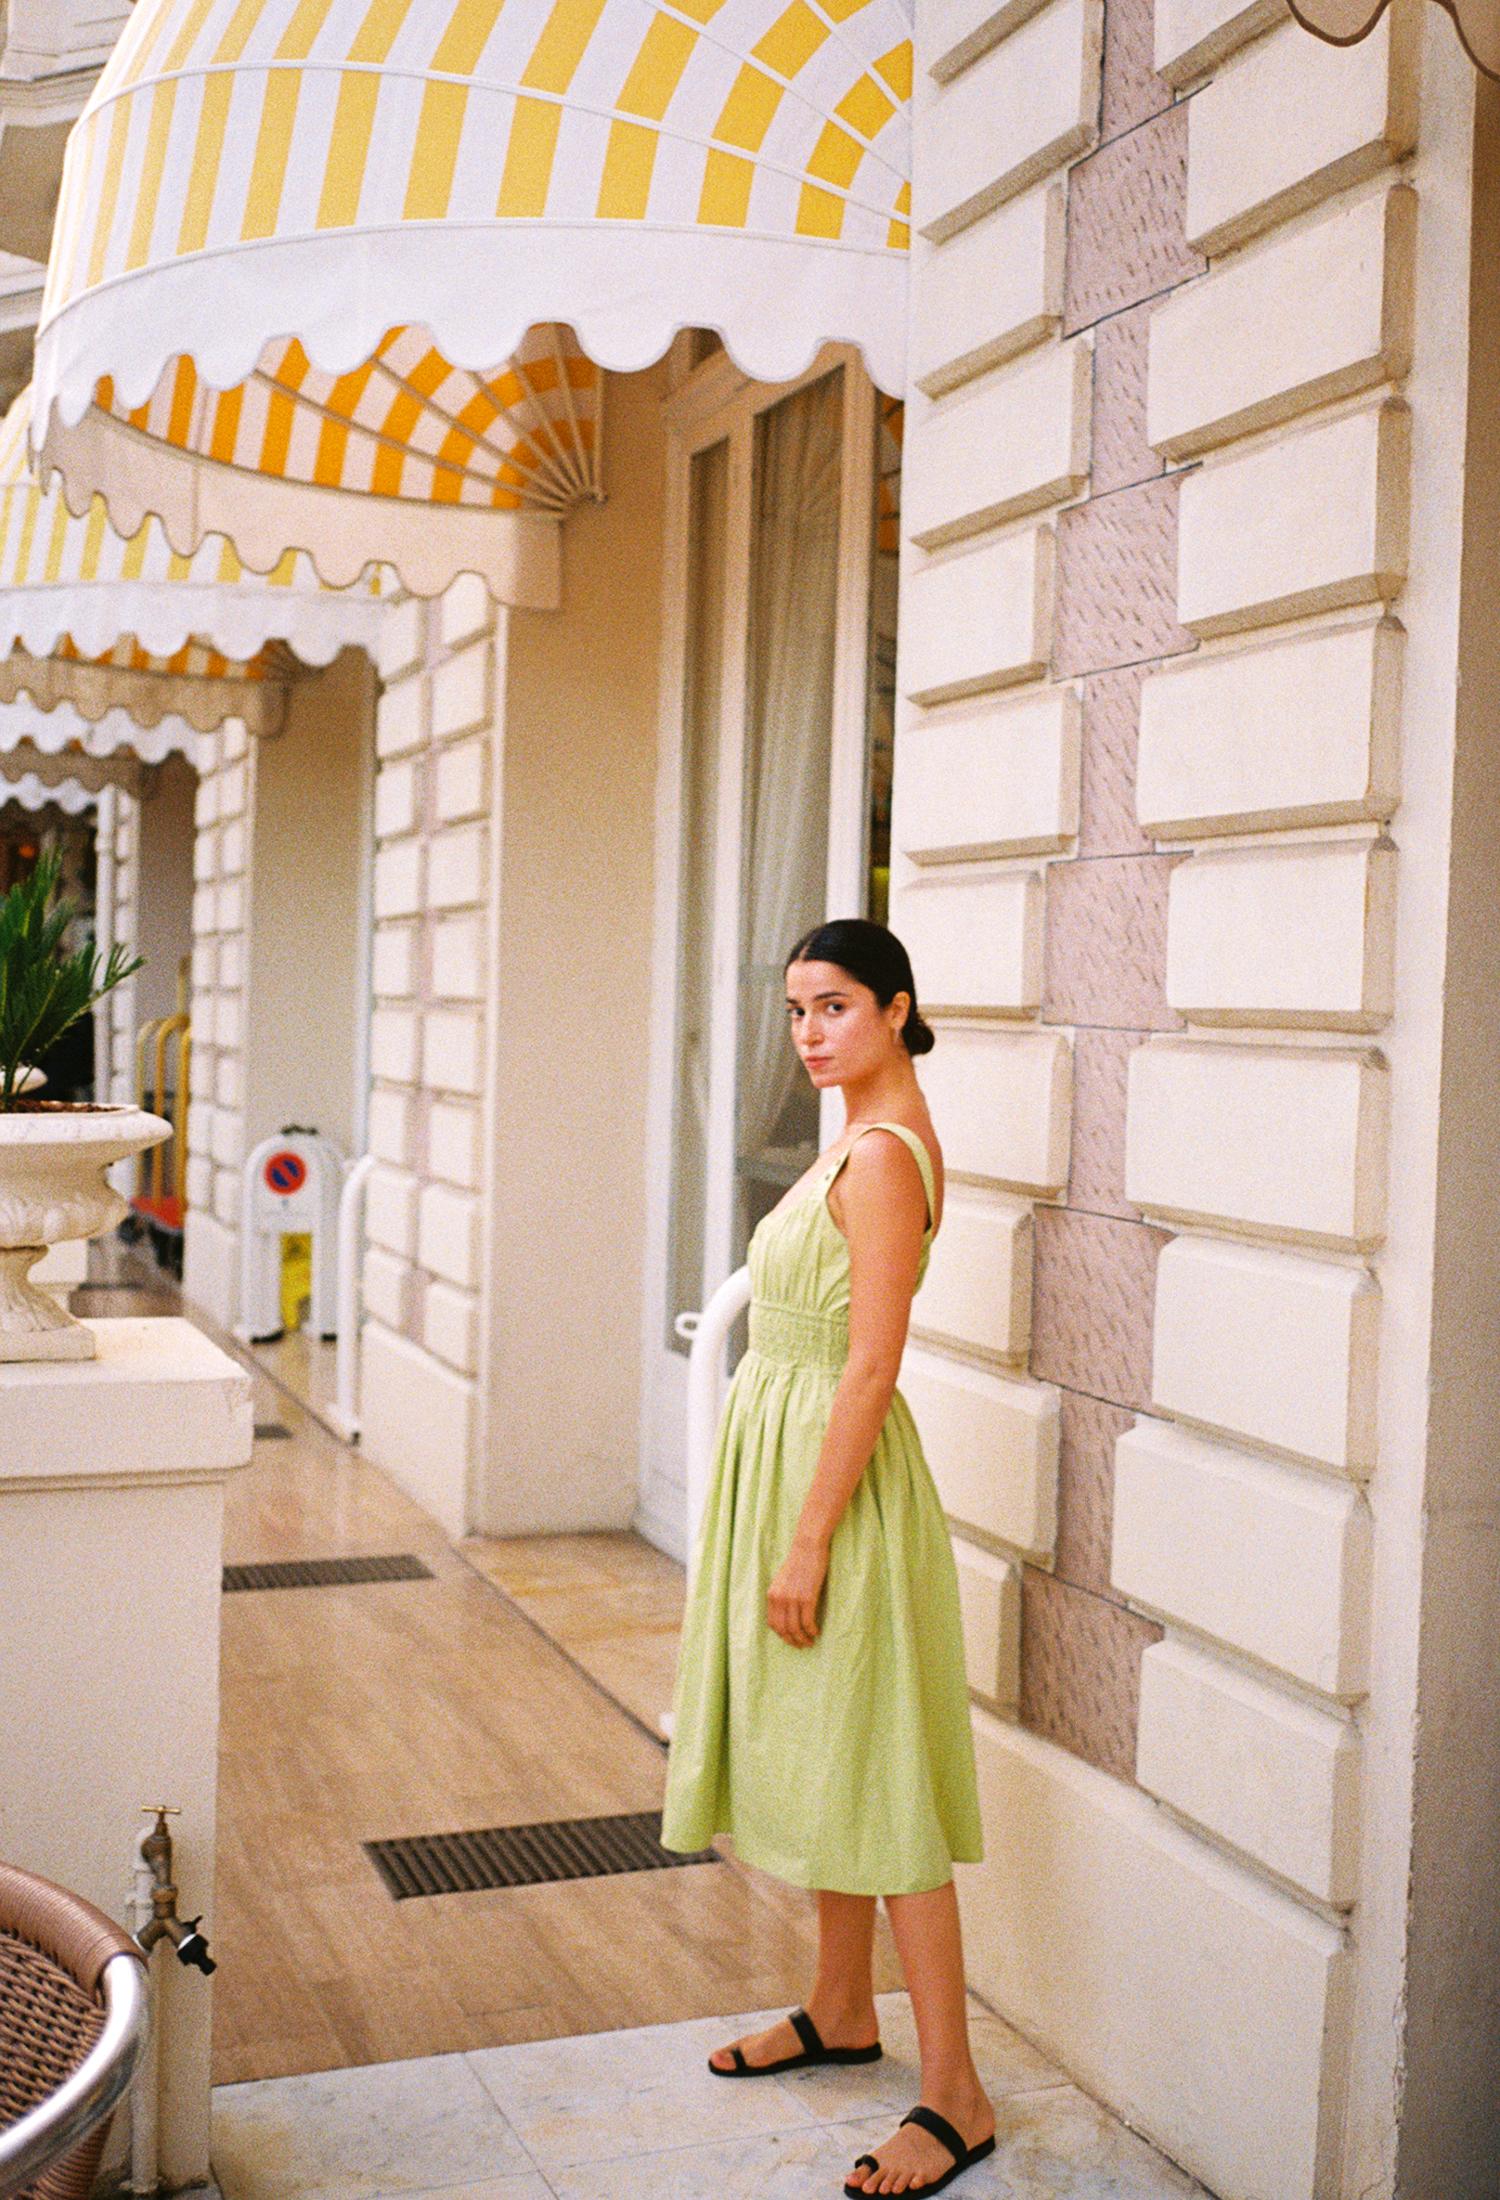 CIAO_LUCIA_GUIDE_FRENCH_RIVERA_ELIANA_RODRIGUEZ_HOTEL_WEEKEND8.jpg